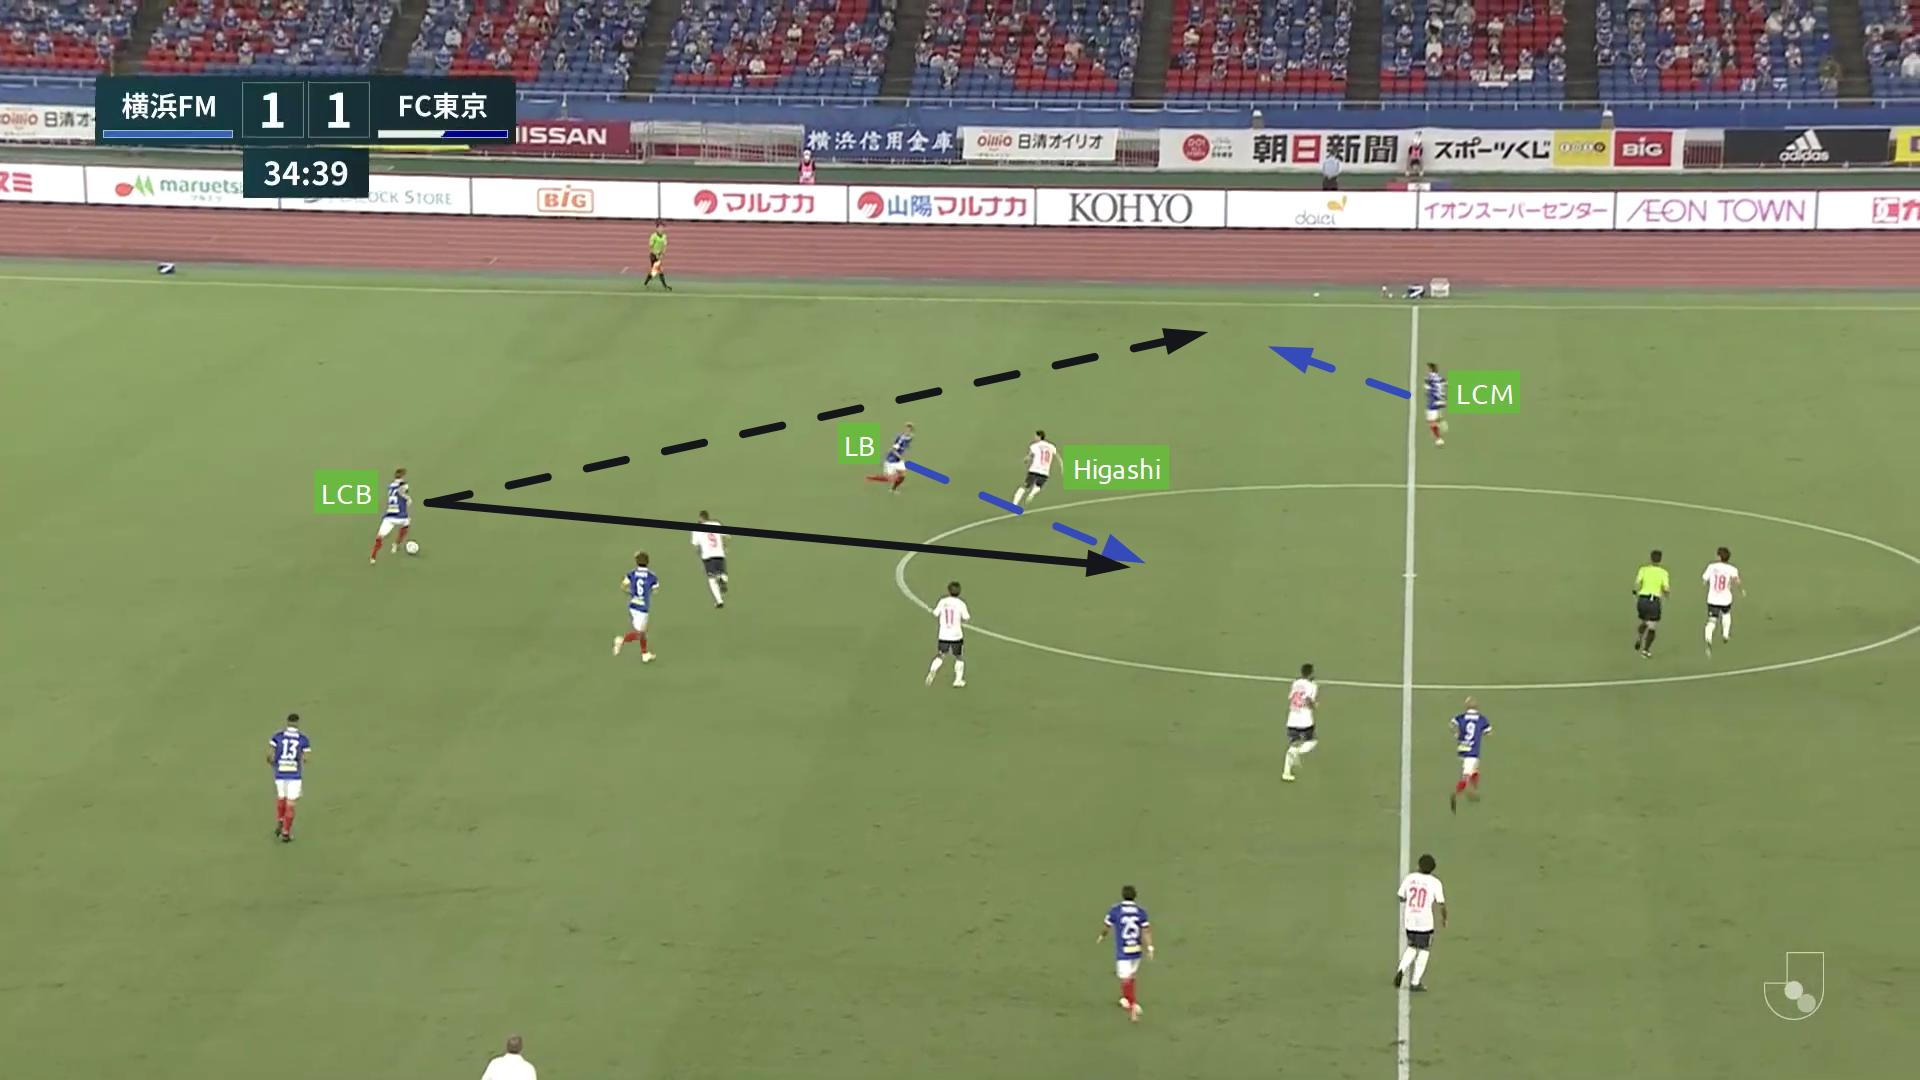 J1 League 2020: Yokohama F. Marinos vs FC Tokyo - tactical analysis tactics